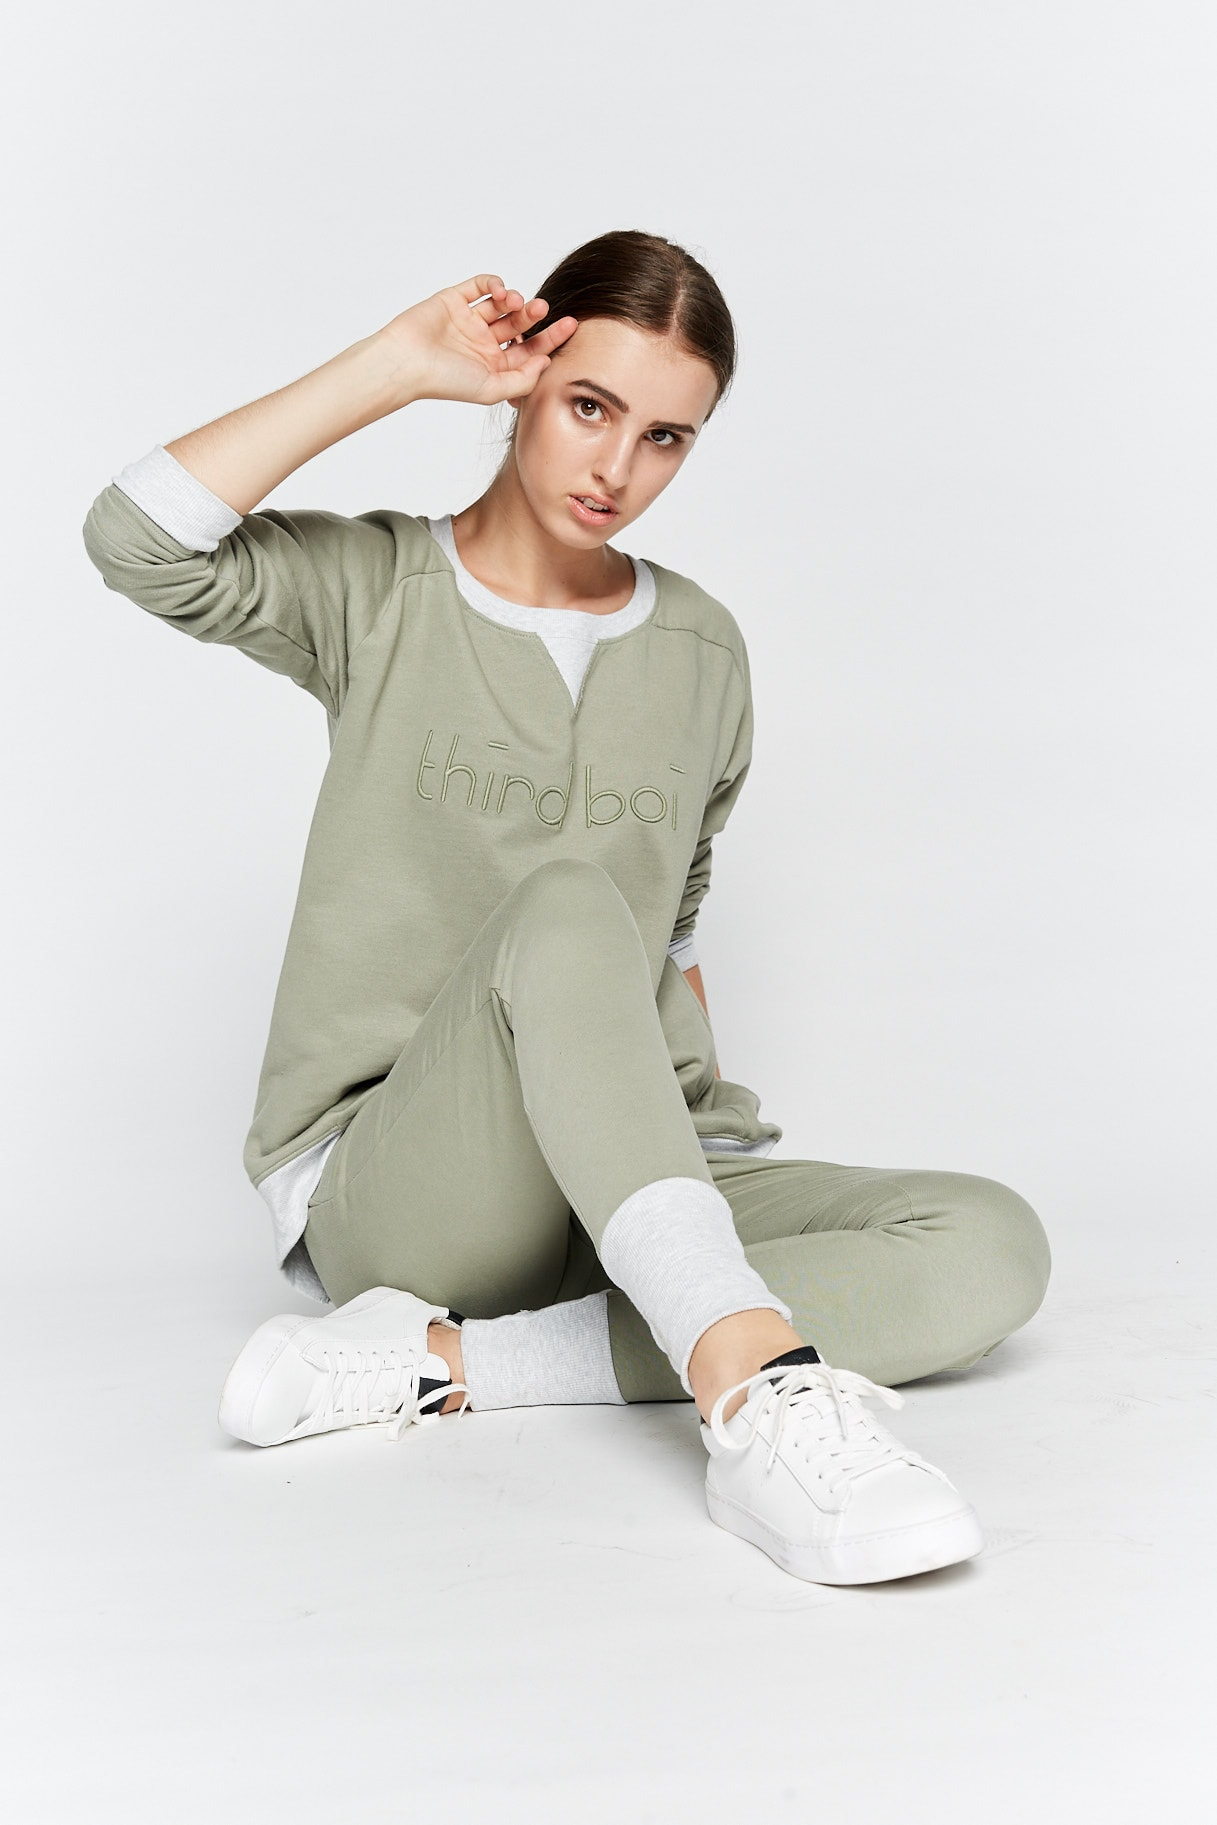 Model wearing Third Boi sweater and leggings